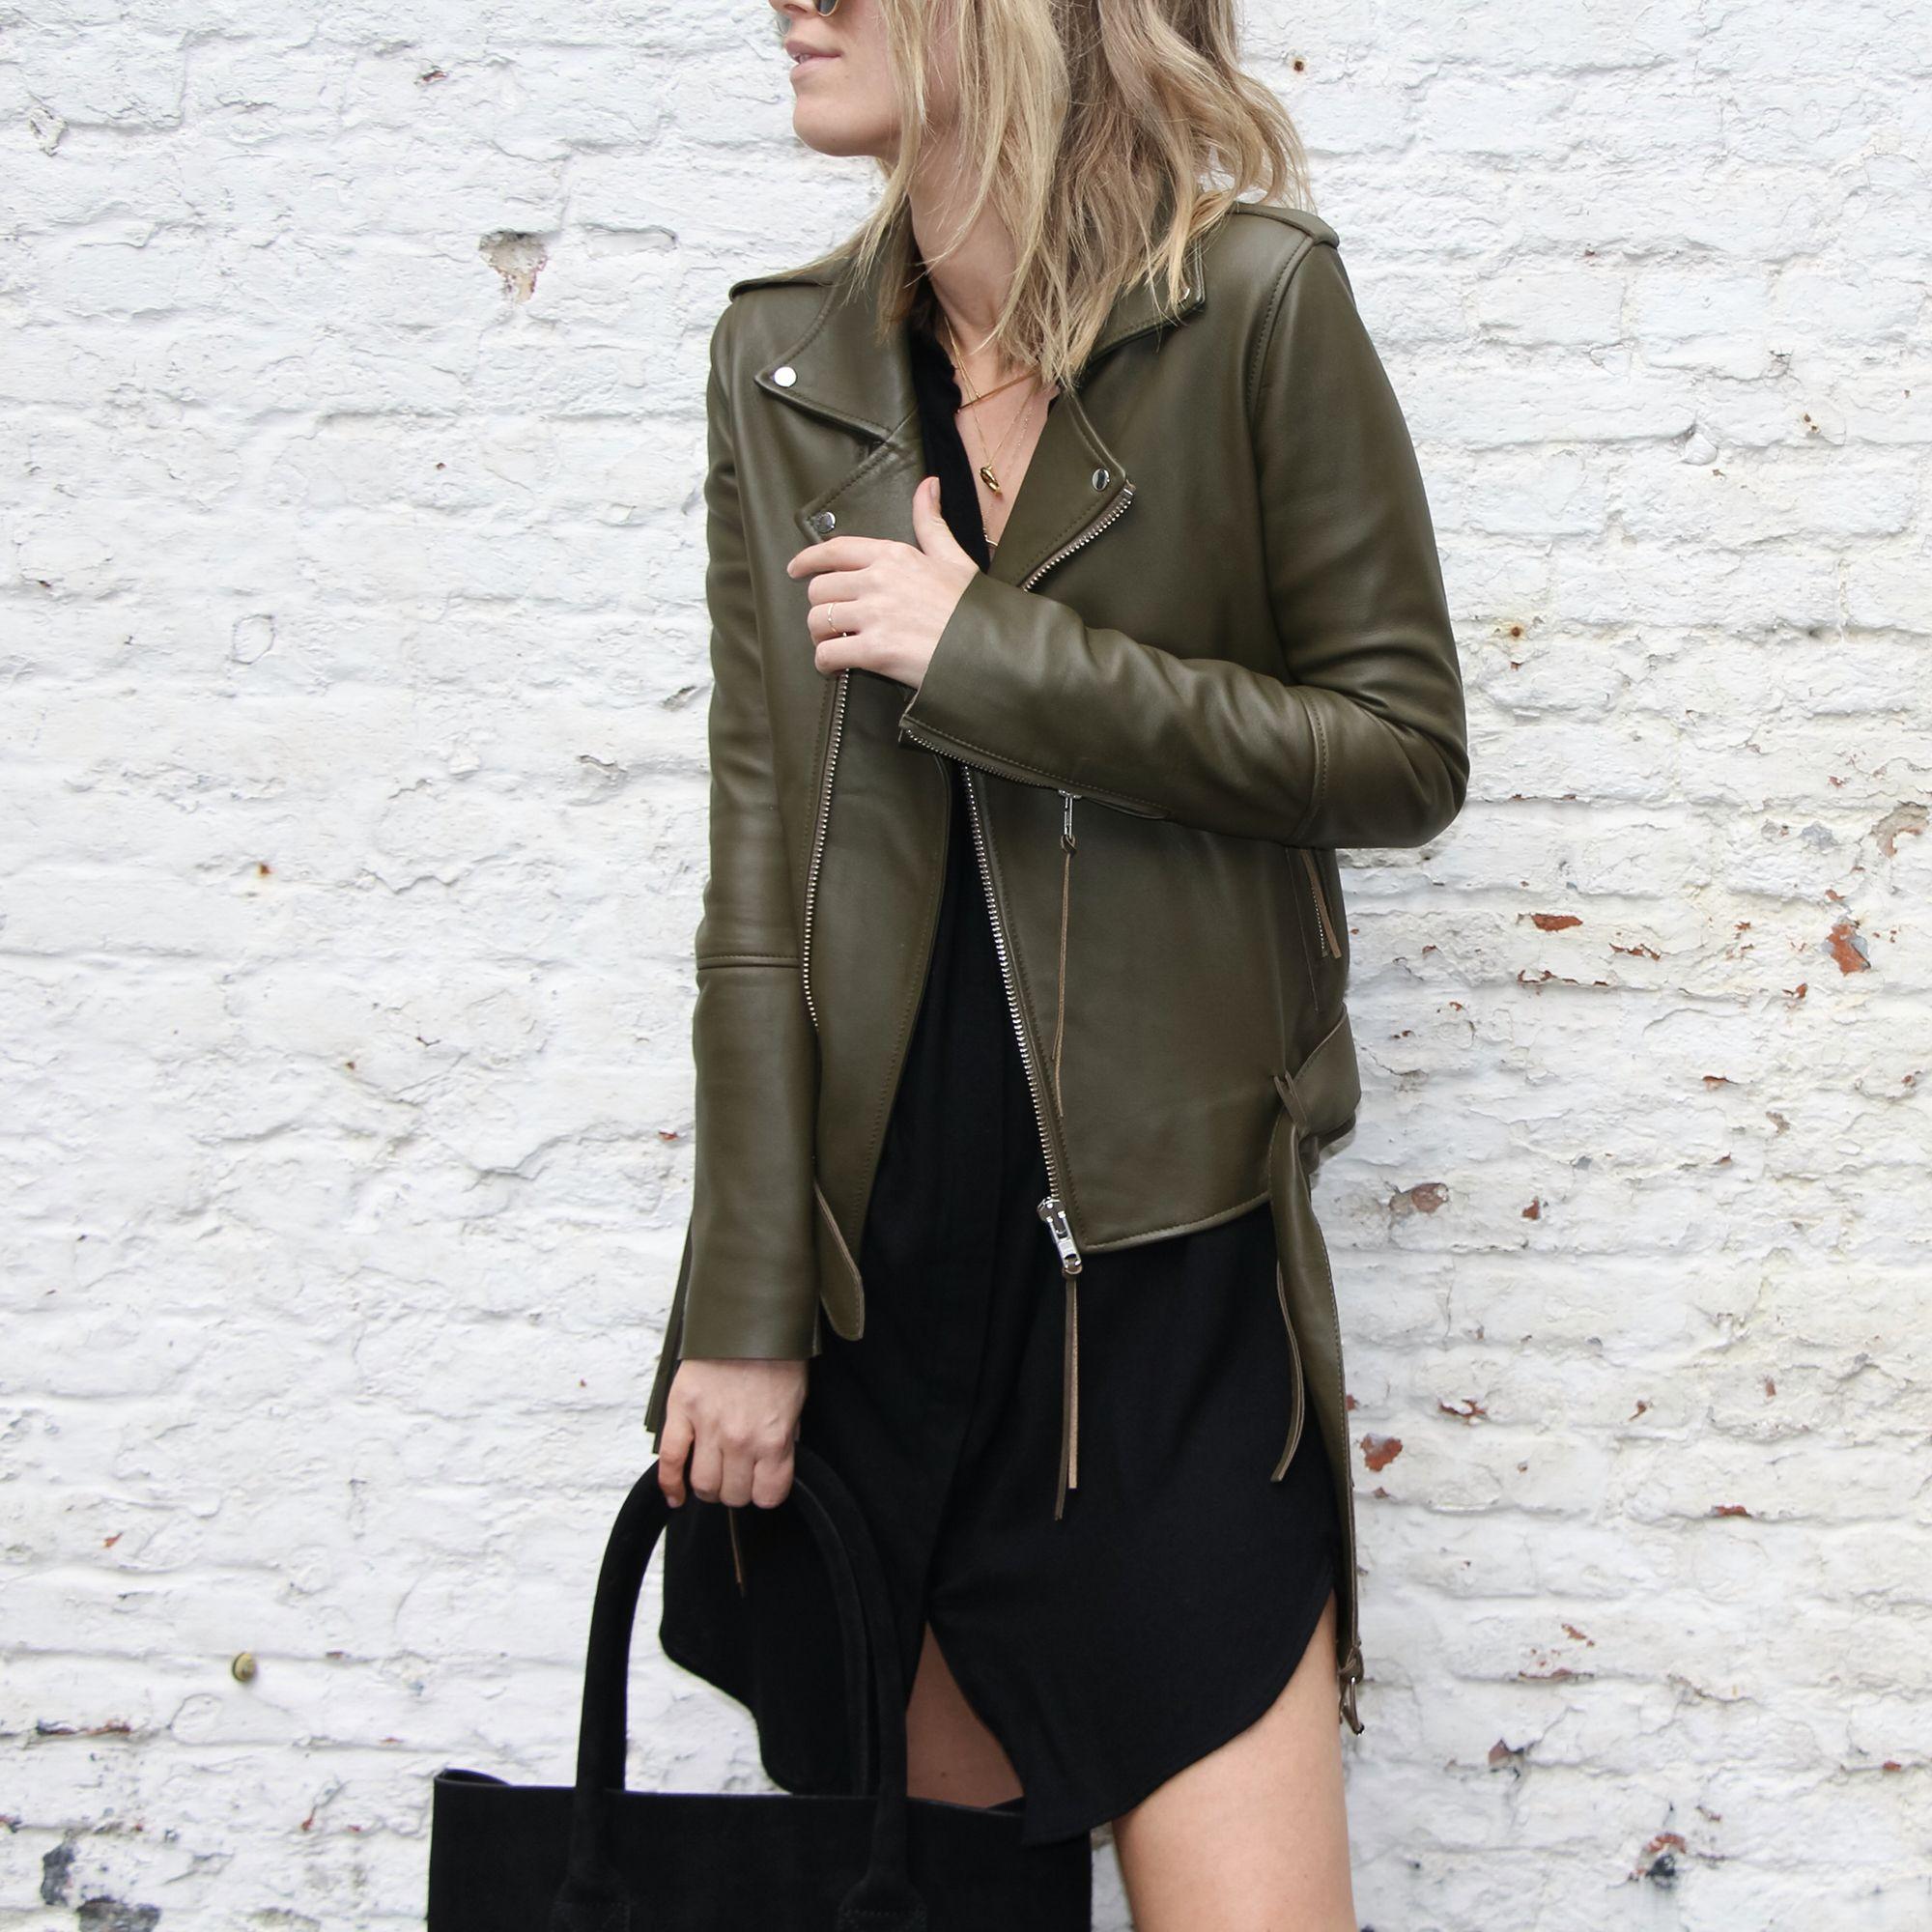 Damoy Minimal Chic Www Damoyantwerp Com Fashion Green Leather Jackets Fashion Outfits [ 2000 x 2000 Pixel ]